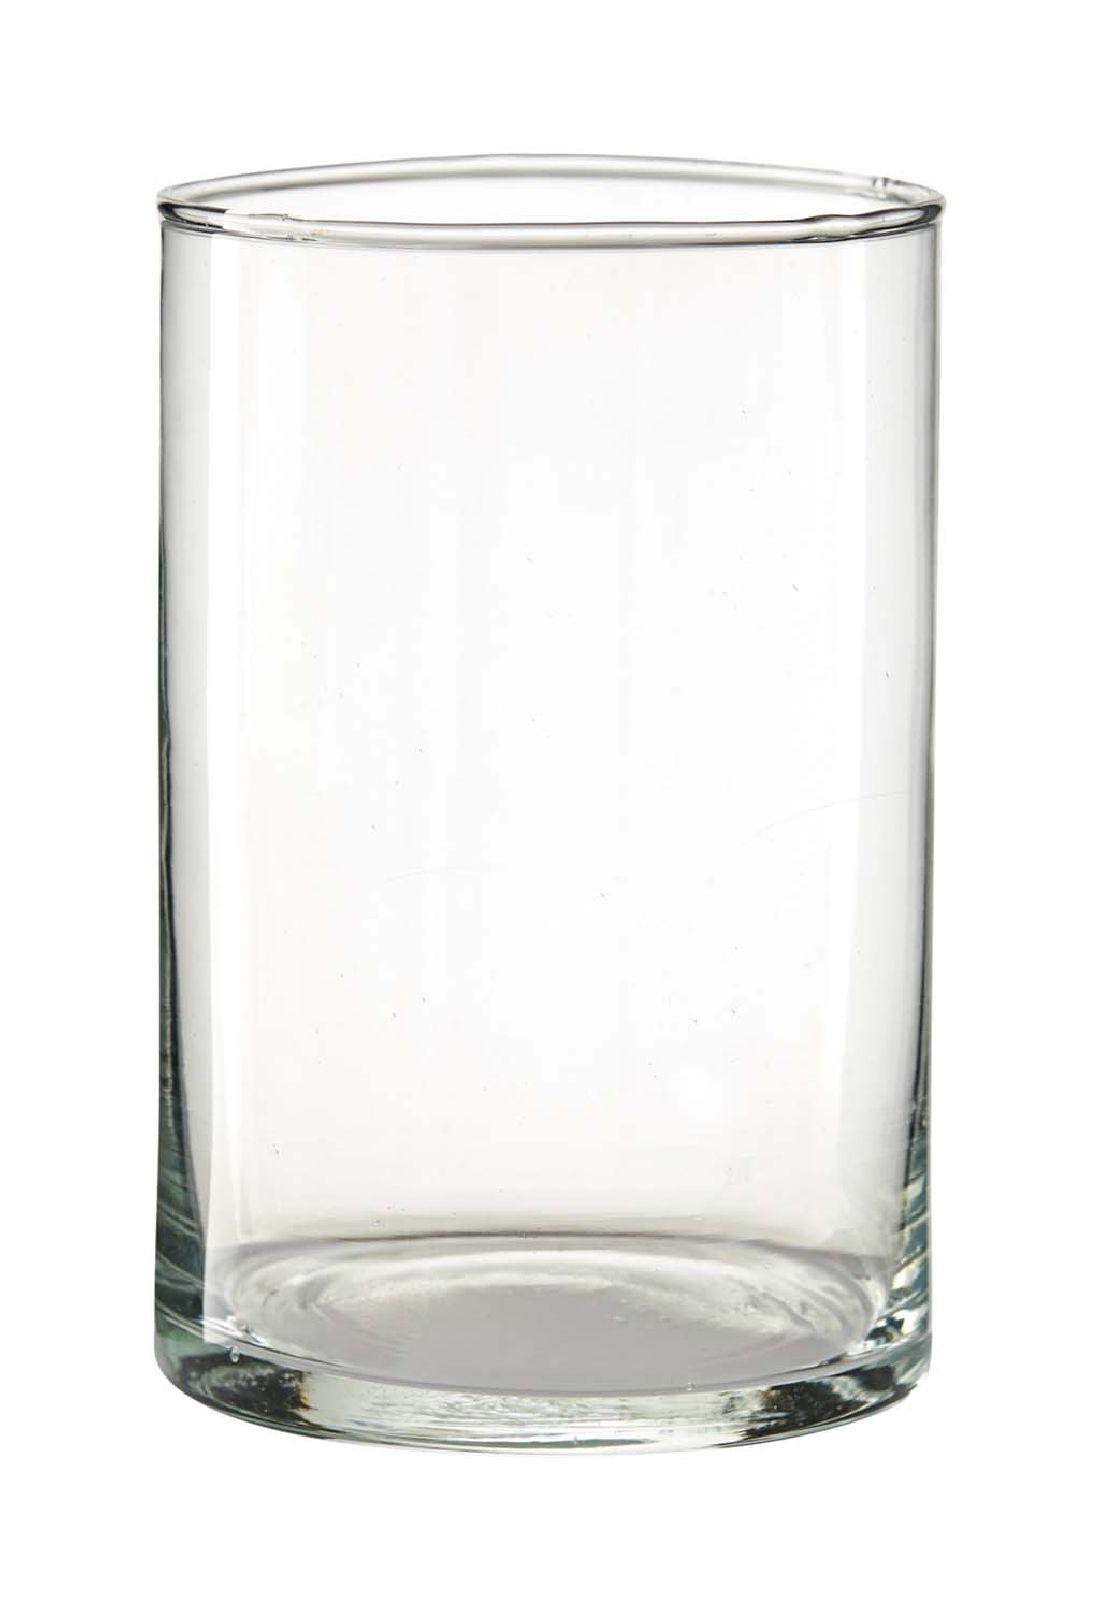 Zylinder Glas press KLAR 1850/20 Ø10cm x H20cm